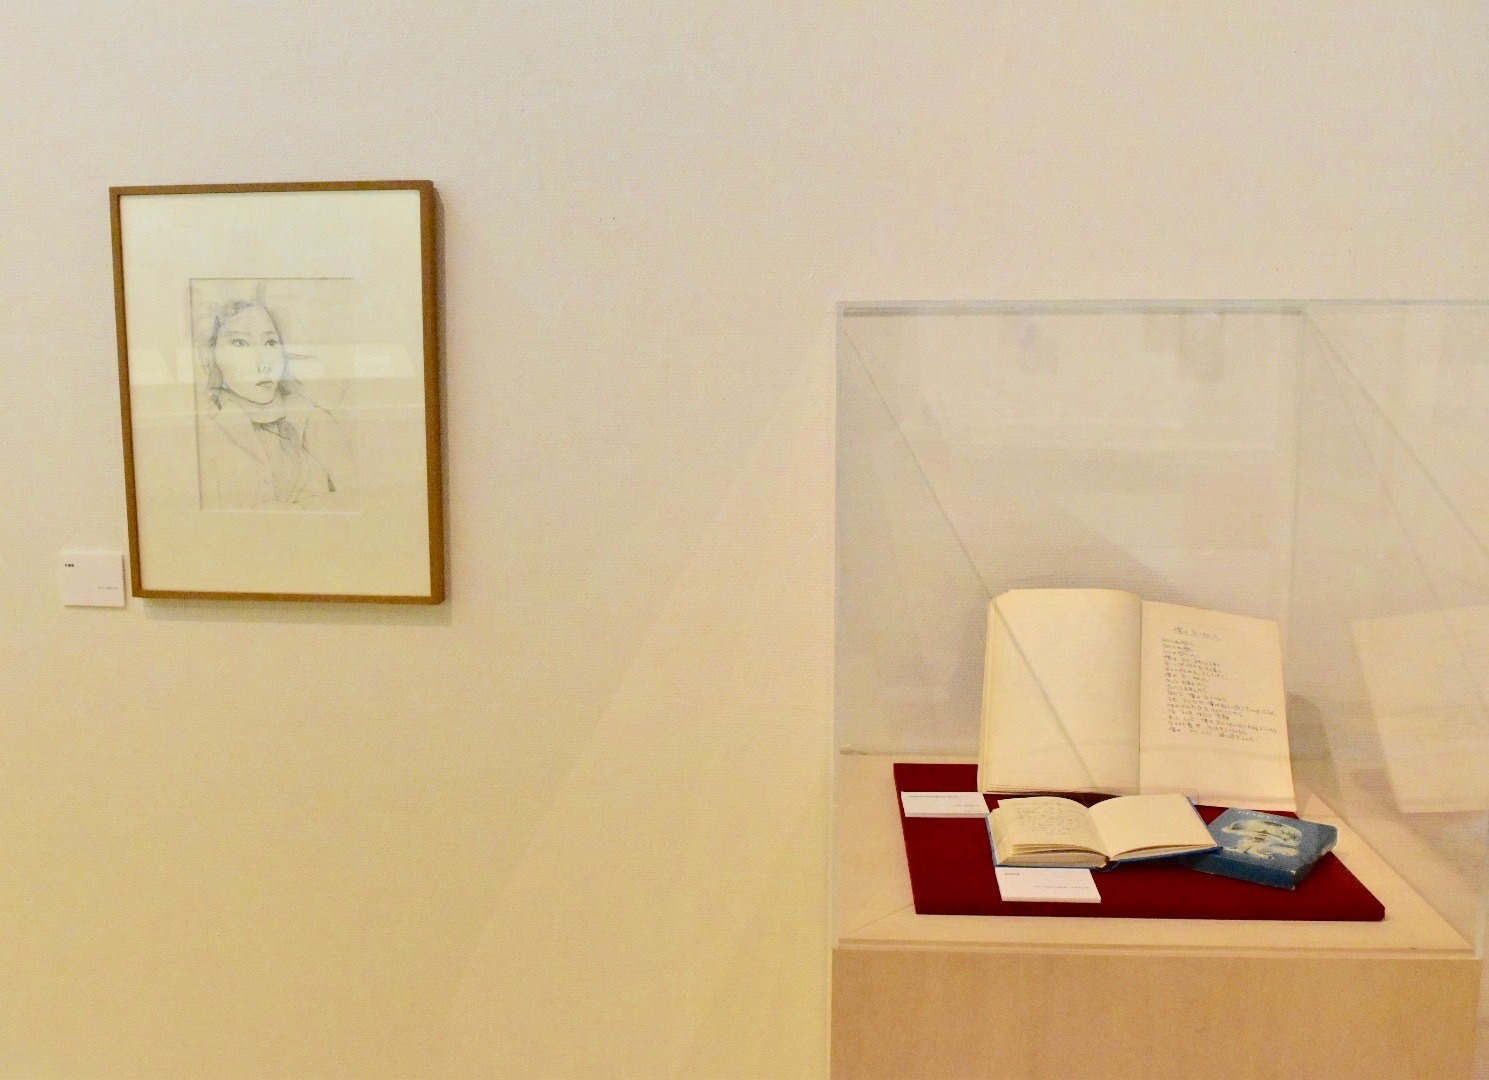 左:肖像画 1977年 右手前:DIARY 1972-2001年 右奥:INNER PORTRAIT Blues 1977年